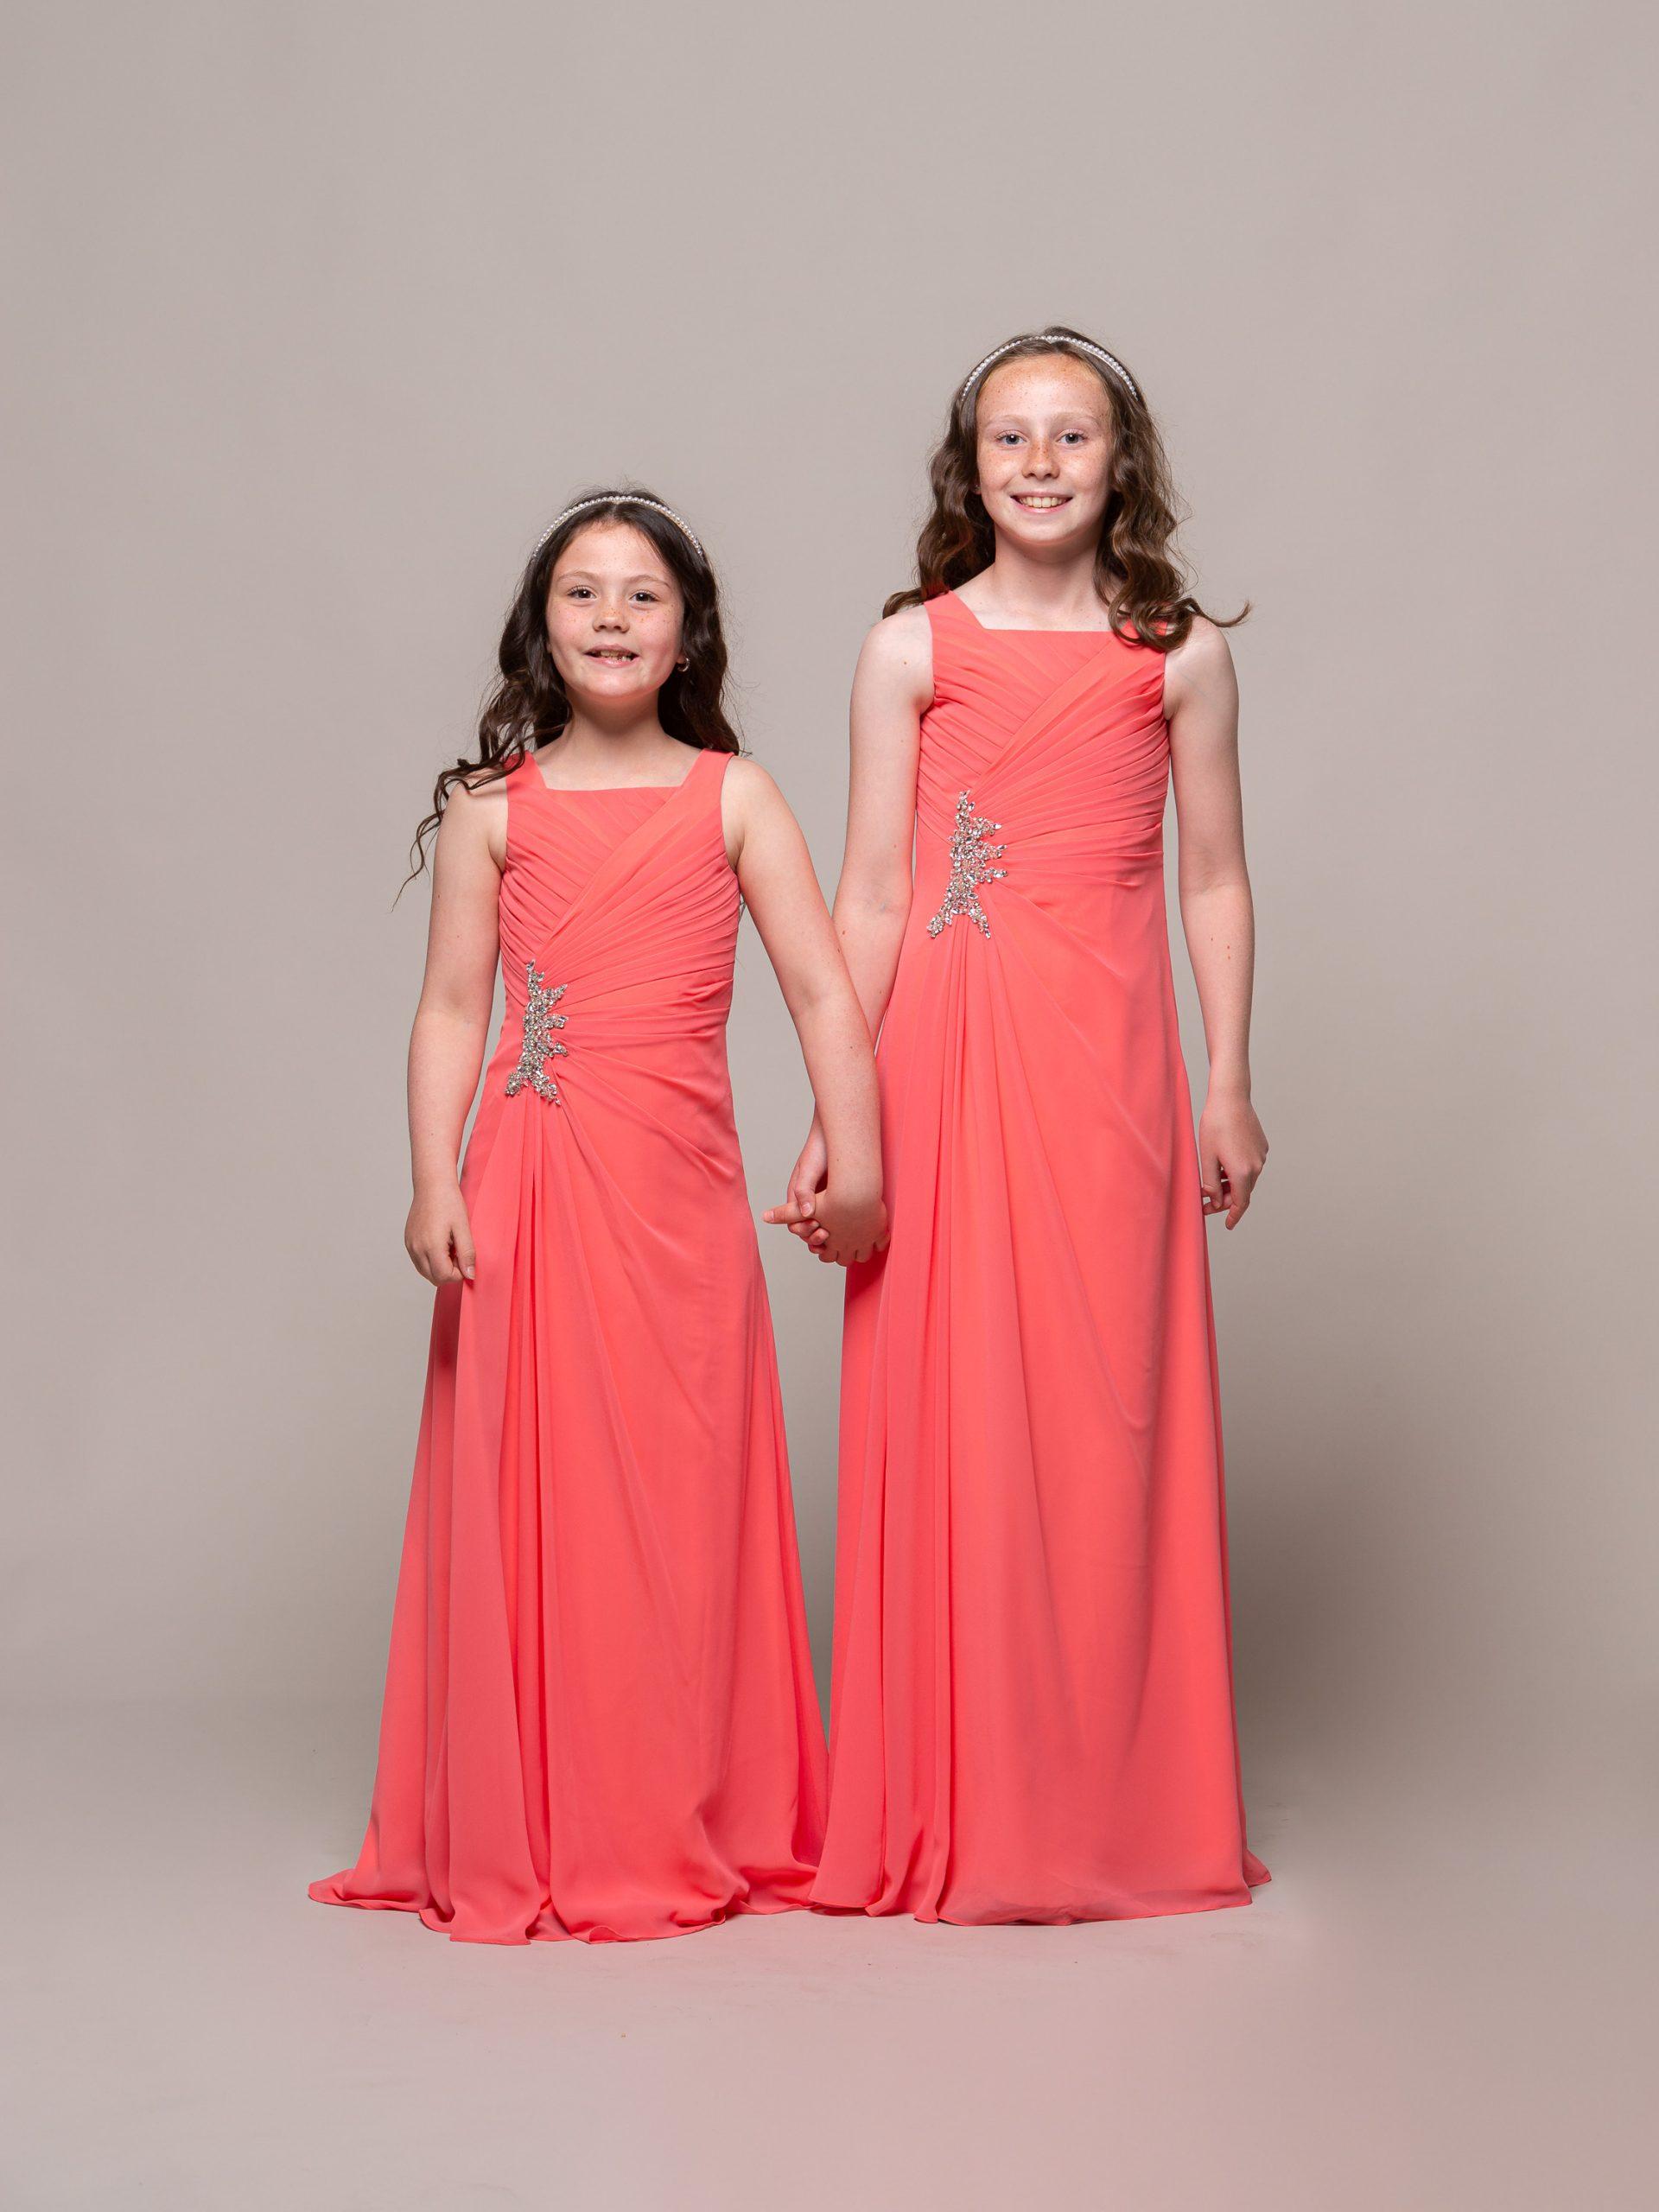 MAB05JNC12 19-4454 - MAB 05 JN Coral 1 Junior bridesmaid dress in coral